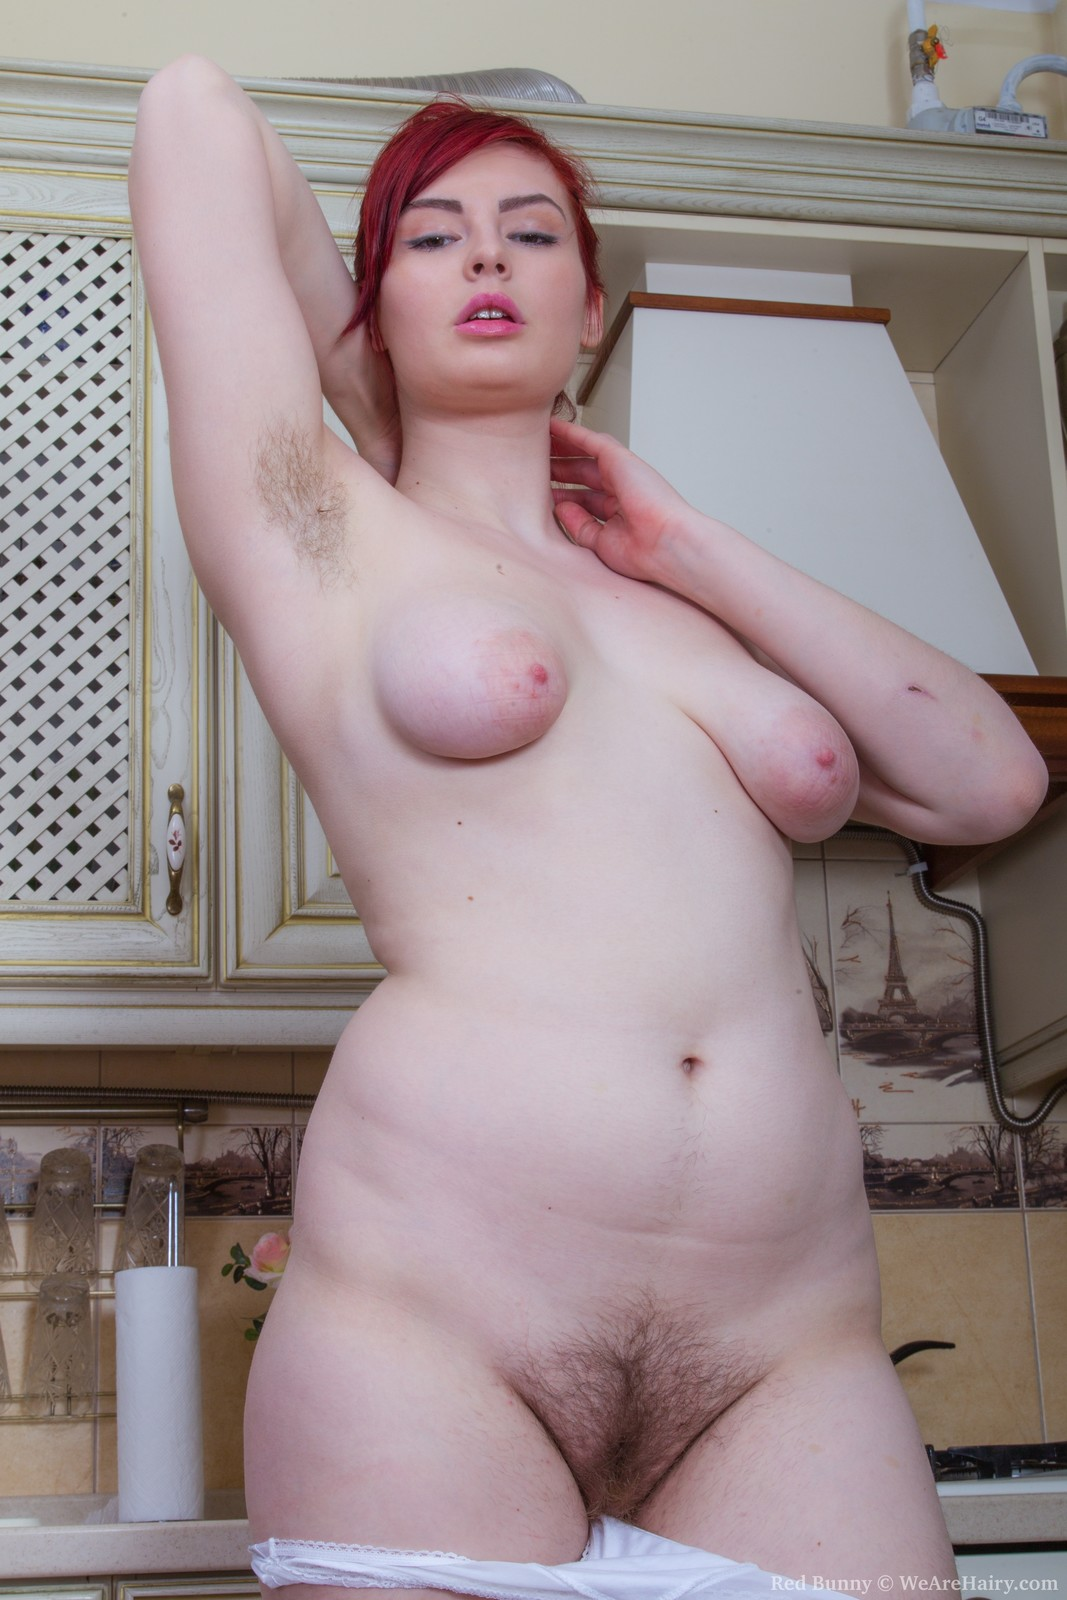 very hairy pussy sandra lyng haugen naked